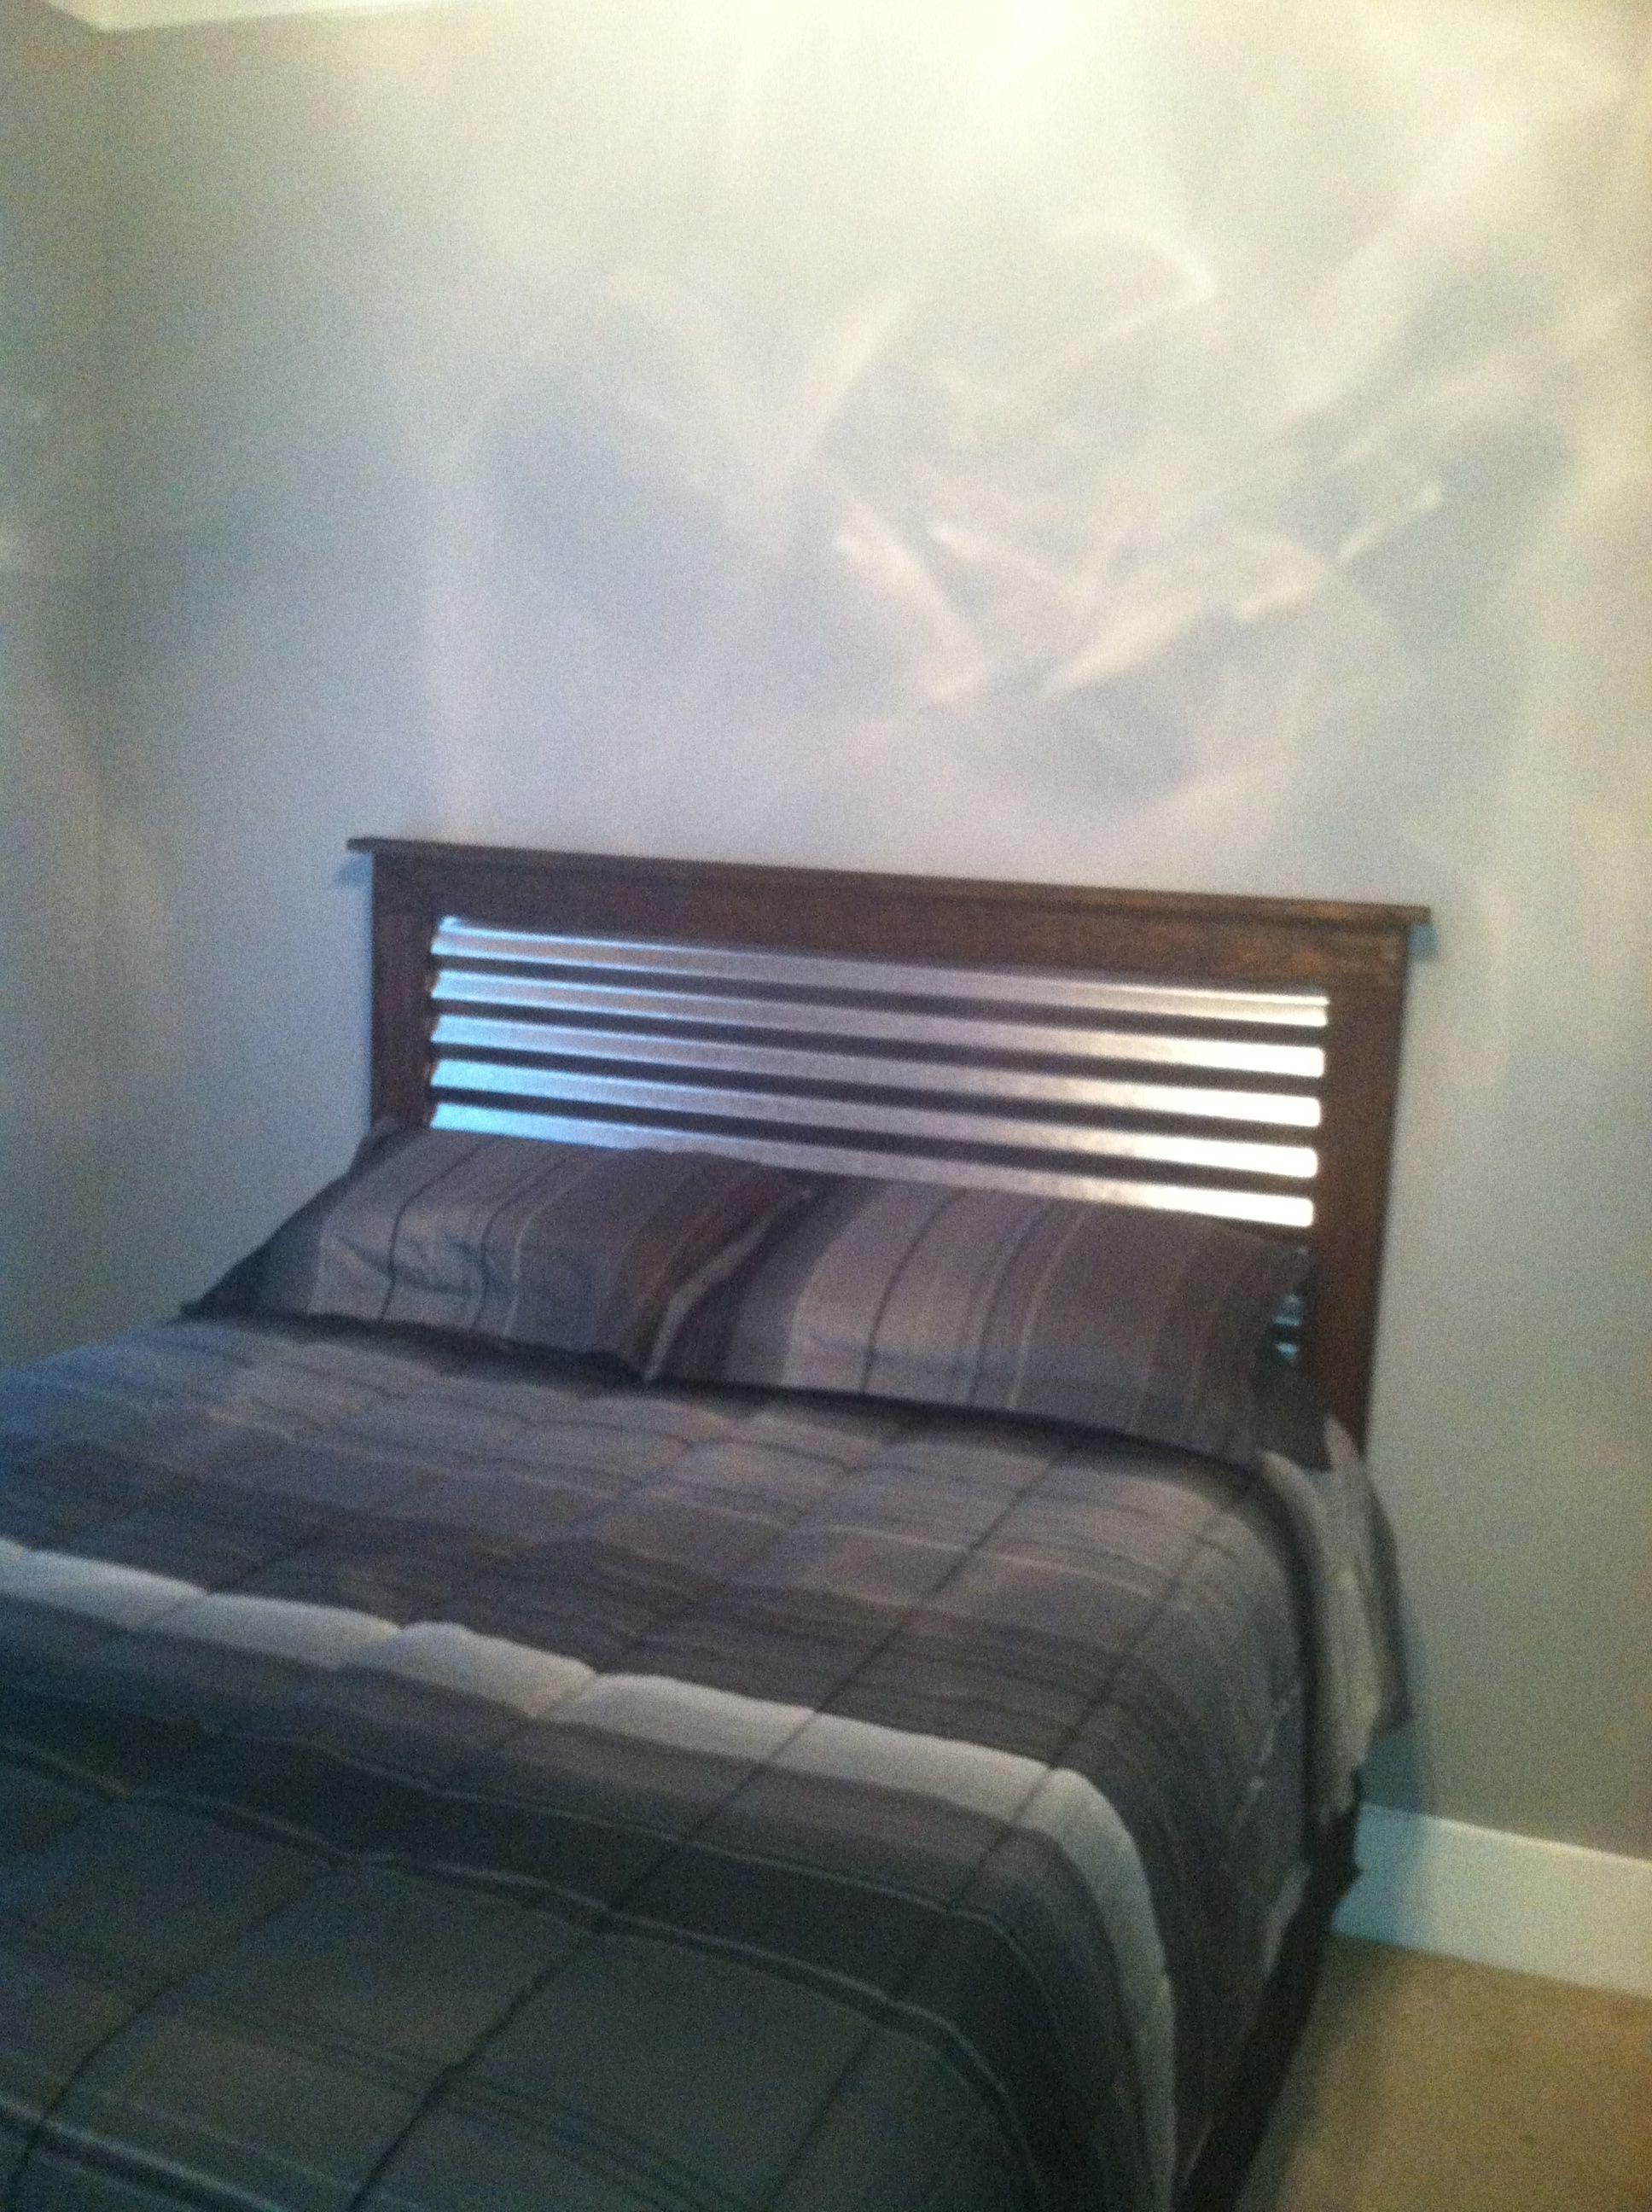 Corrugated metal on wood headboard | I made it | Pinterest ...